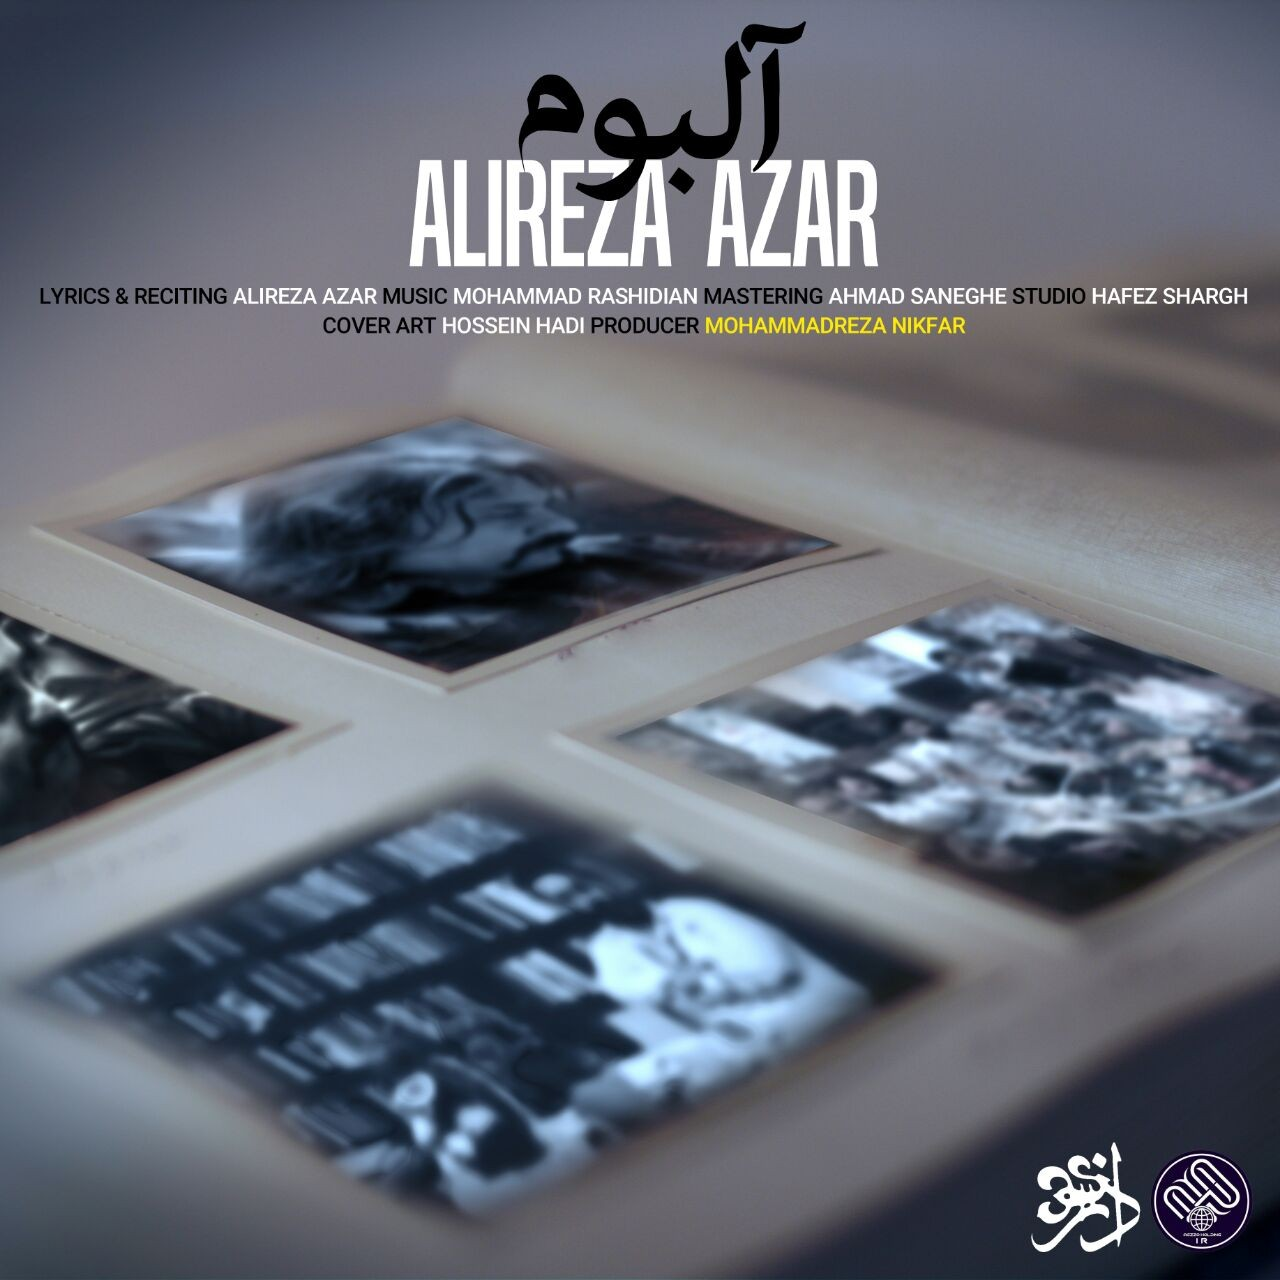 Alireza Azar – Album